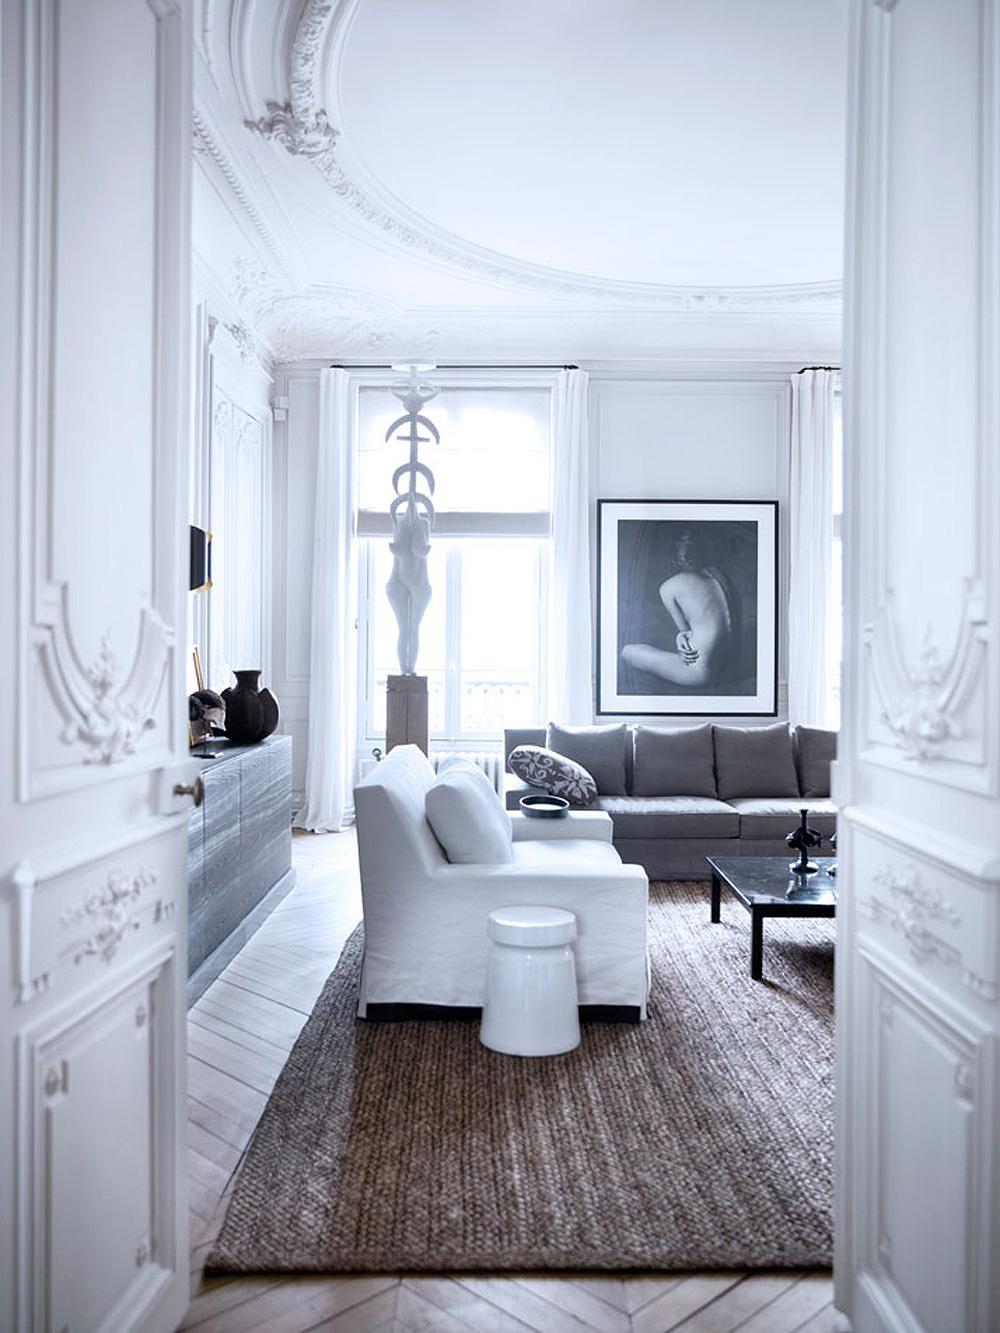 Paris-Apartment-Tour-Art-2.jpg